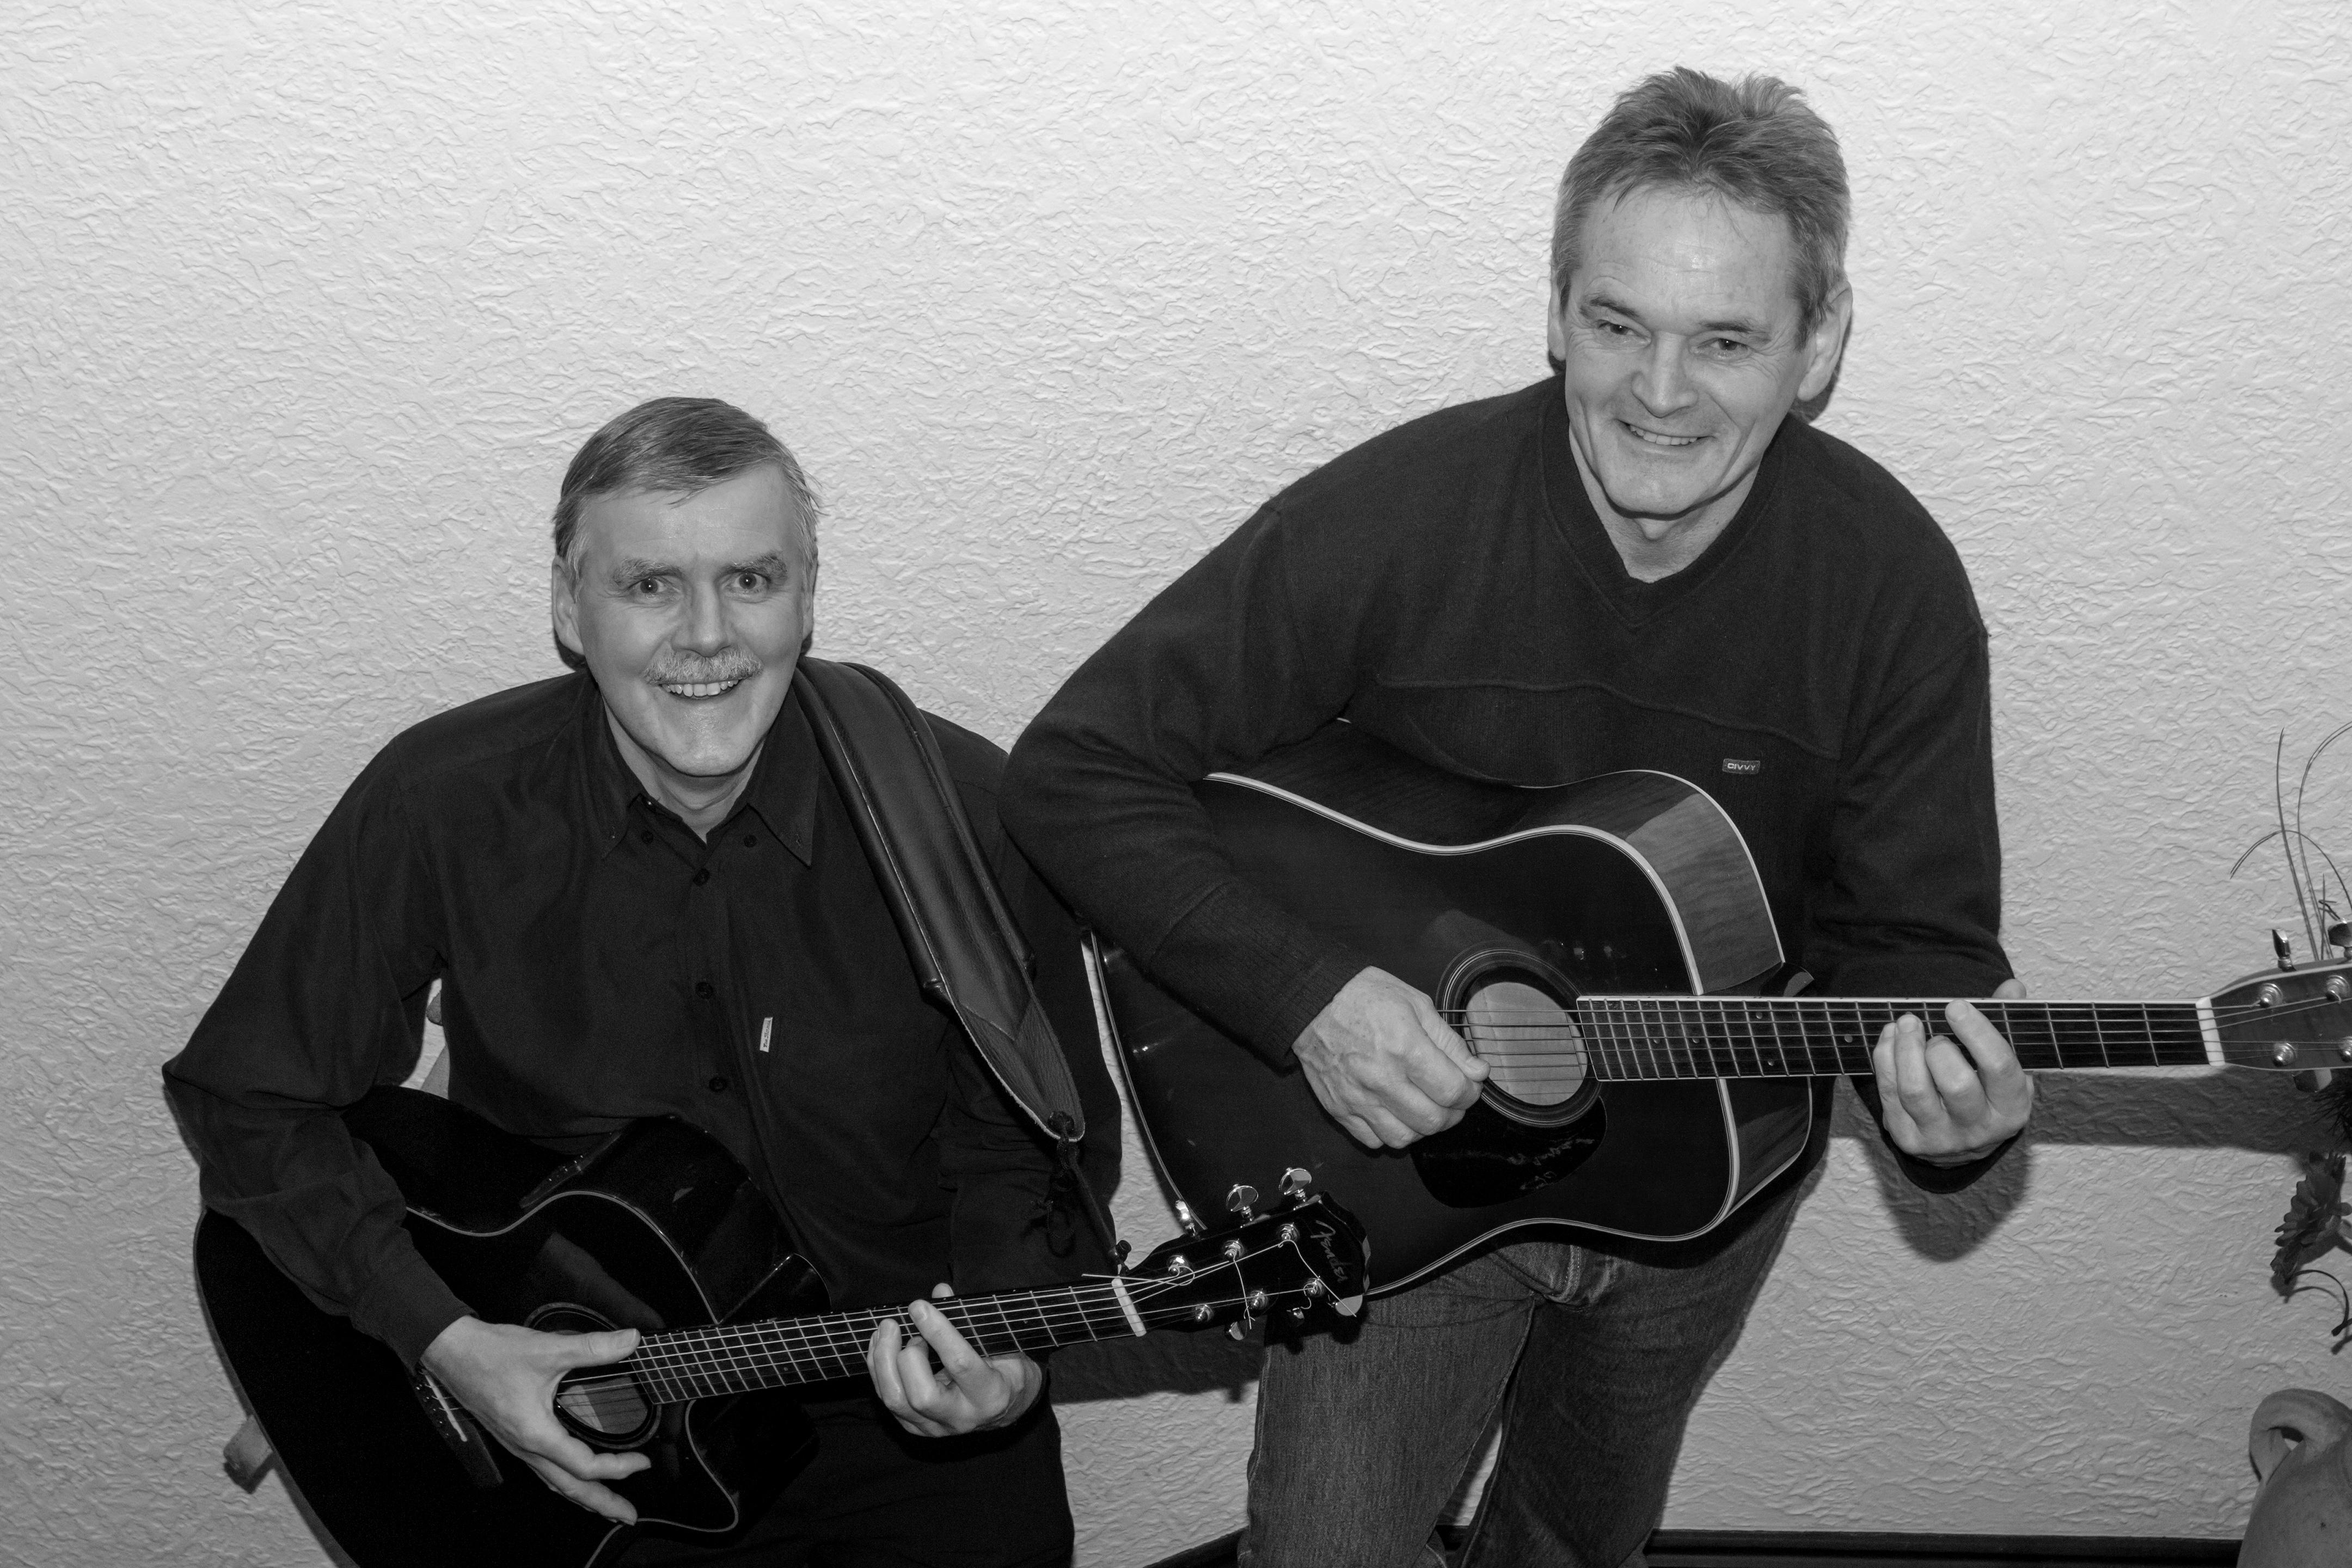 George and Steve